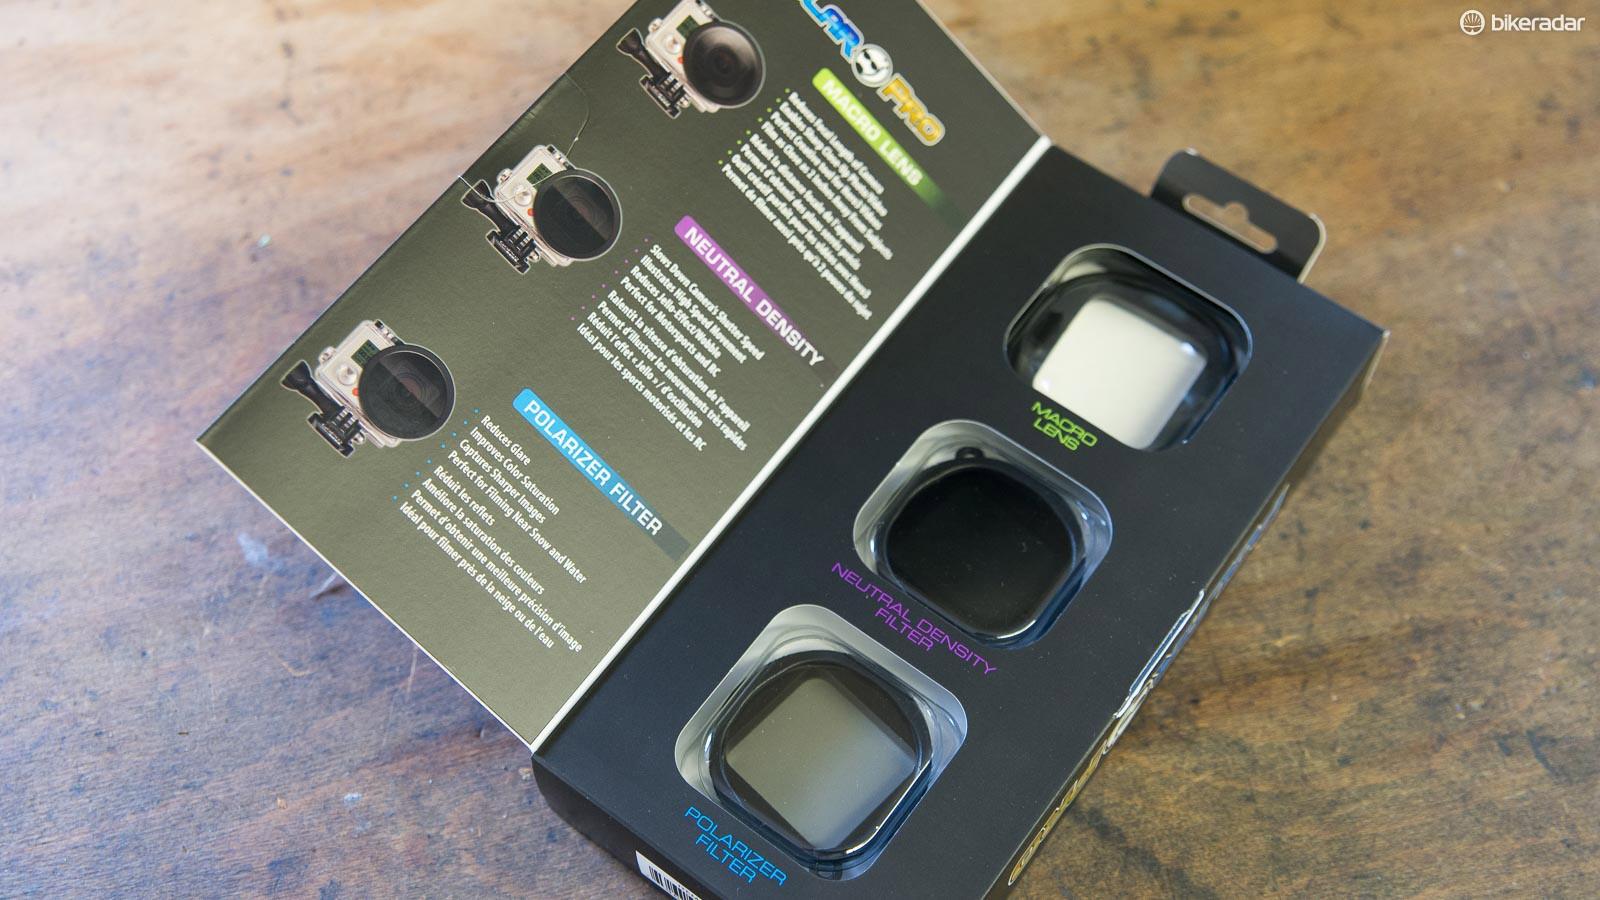 Polar Pro GoPro Hero 3+ filter three pack